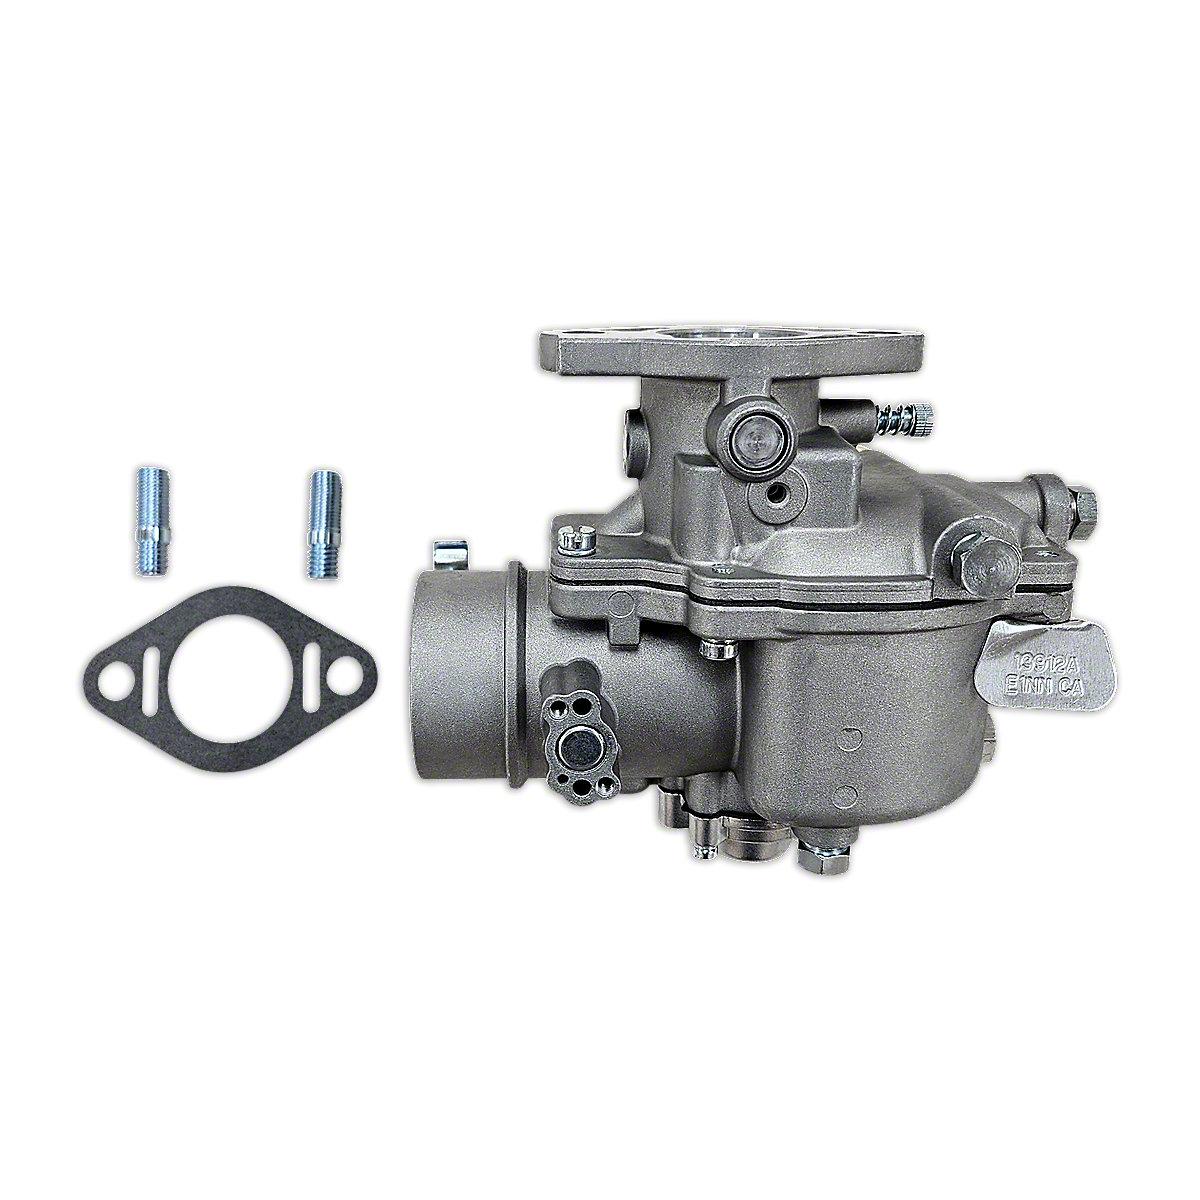 Carburetor Fds3450 Zenith Parts Diagram